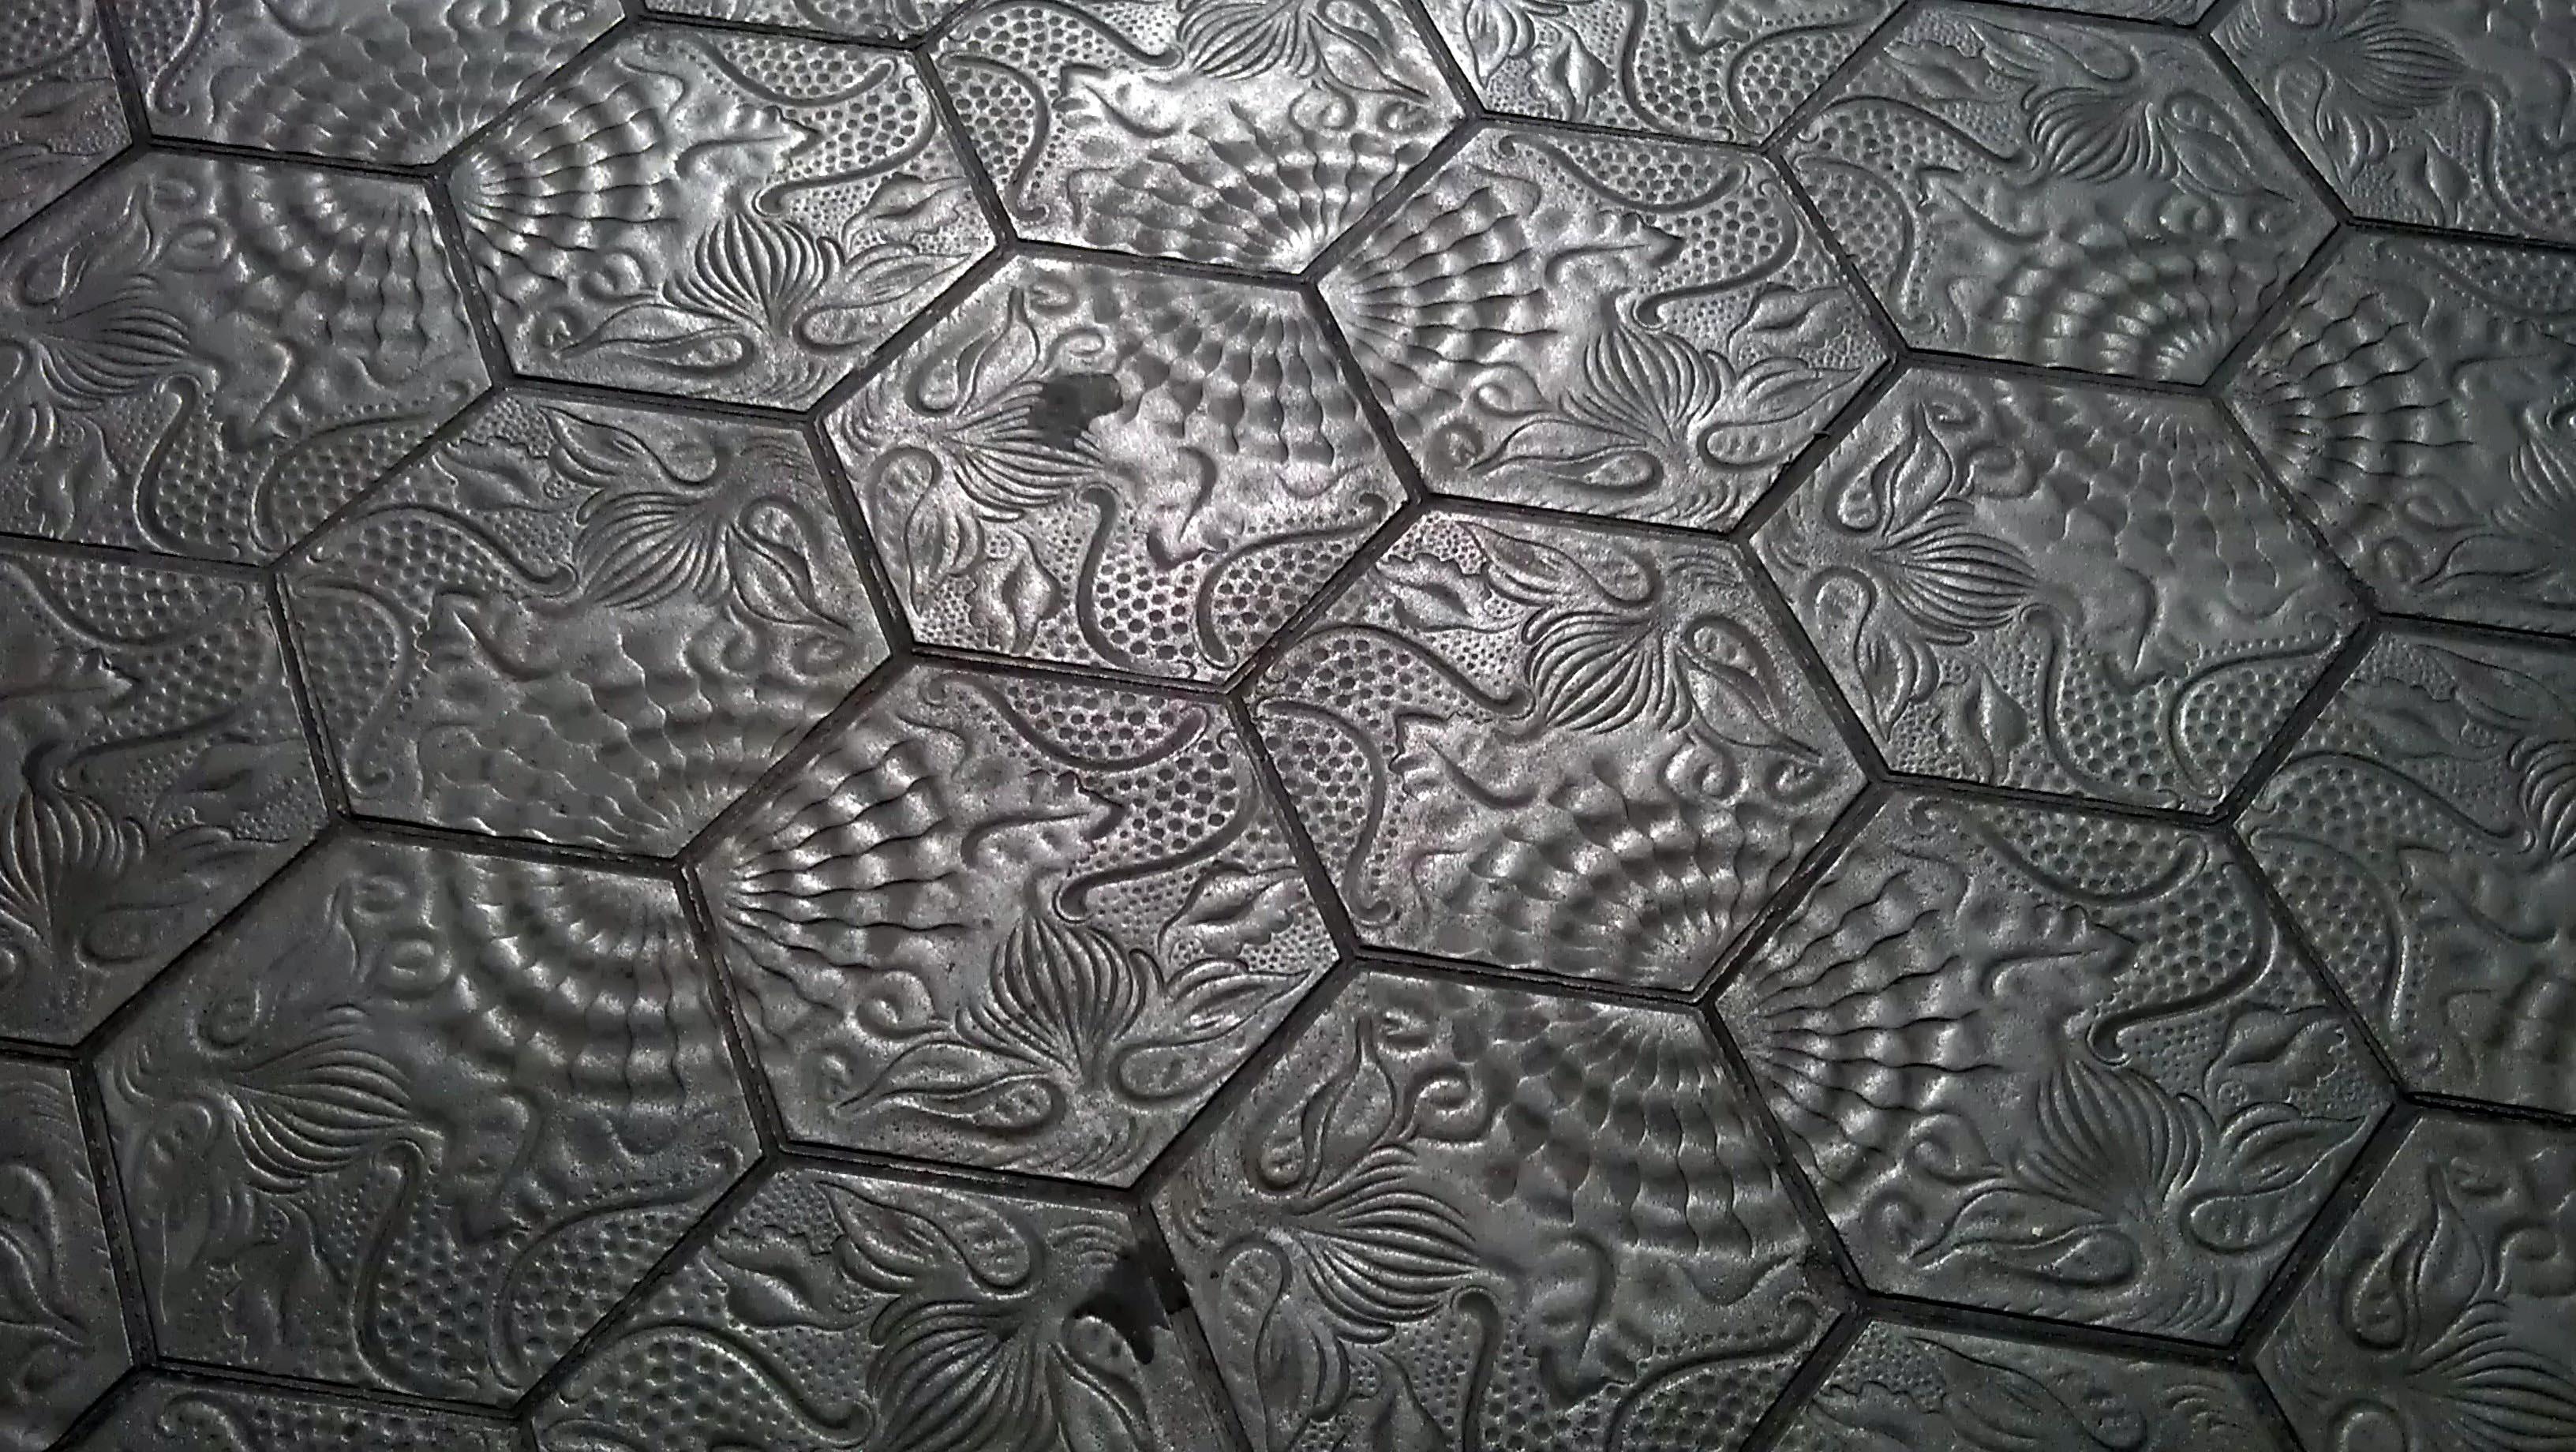 03-Panot-Gaudi-escofet-ceramica a mano alzada